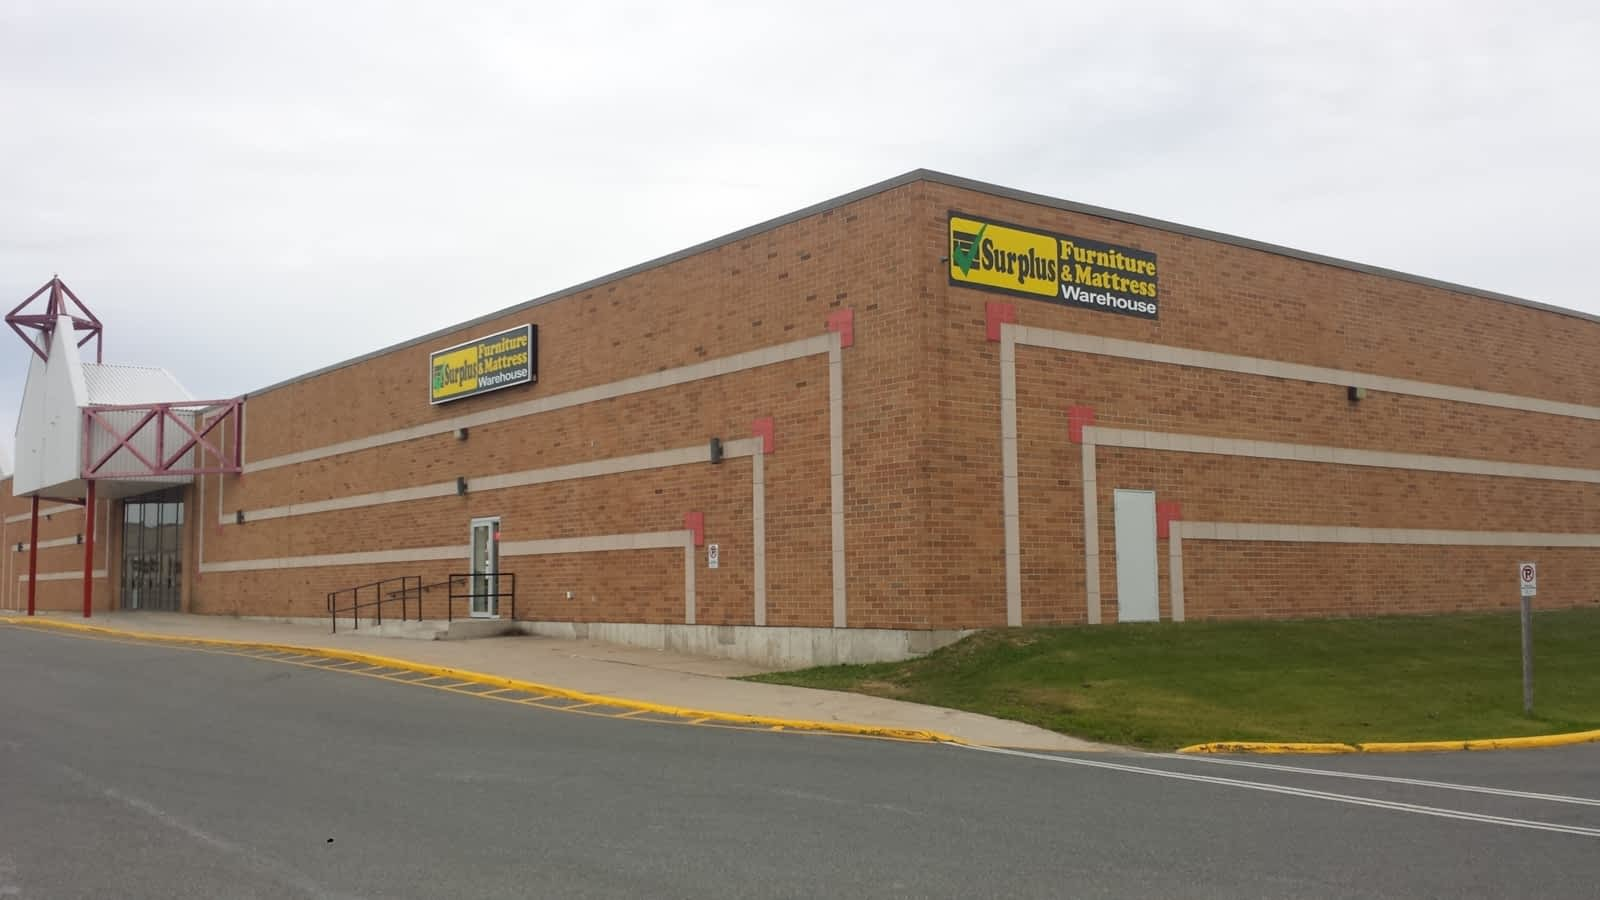 Surplus Furniture U0026 Mattress Warehouse   Opening Hours   435 Brookside Dr,  Fredericton, NB